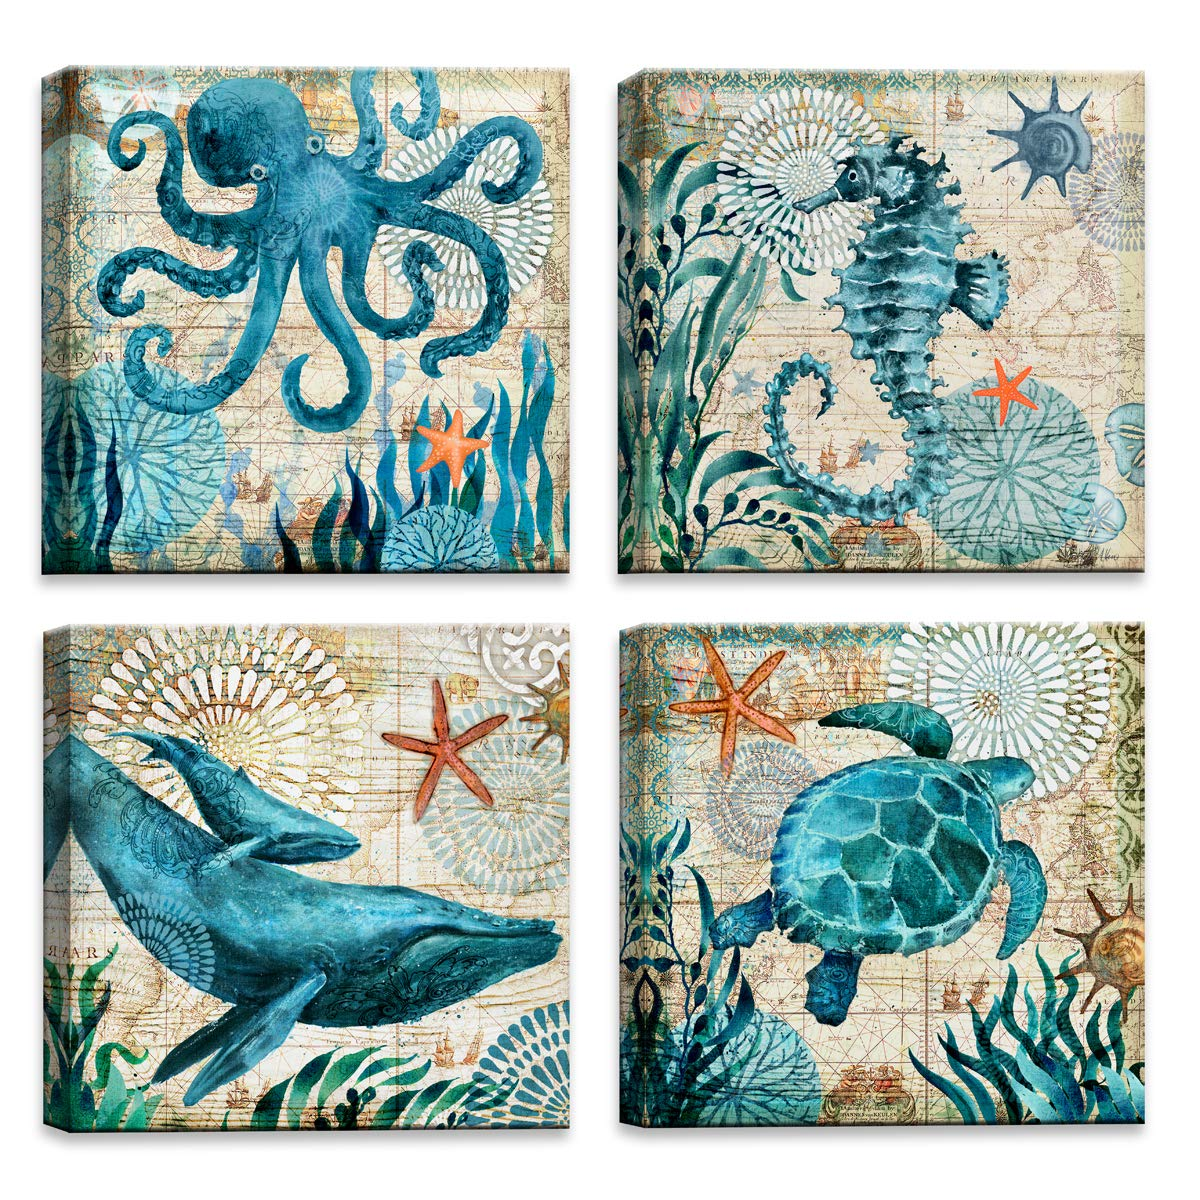 Bathroom Wall Decor Octopus Turtle Seahorse Whale Animal Pictures Bathroom Wall Art Teal Sea Turtle Theme